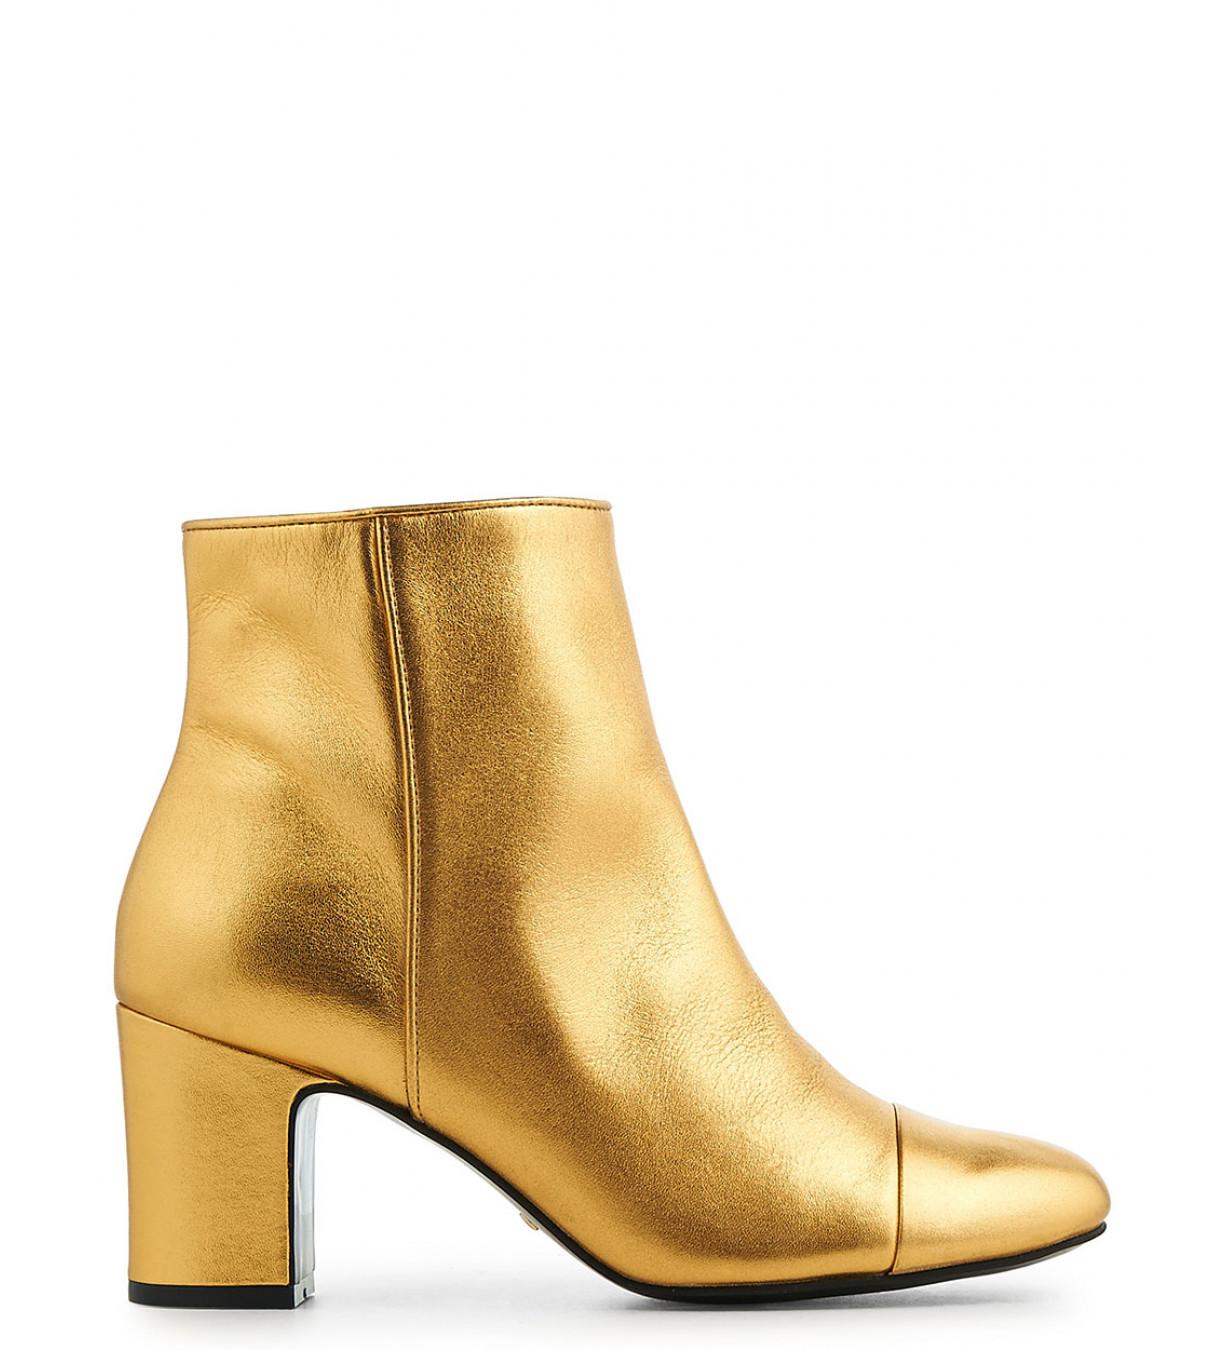 14. boots-graziela-cuir-metalise-veau-or-chaussures-mariee